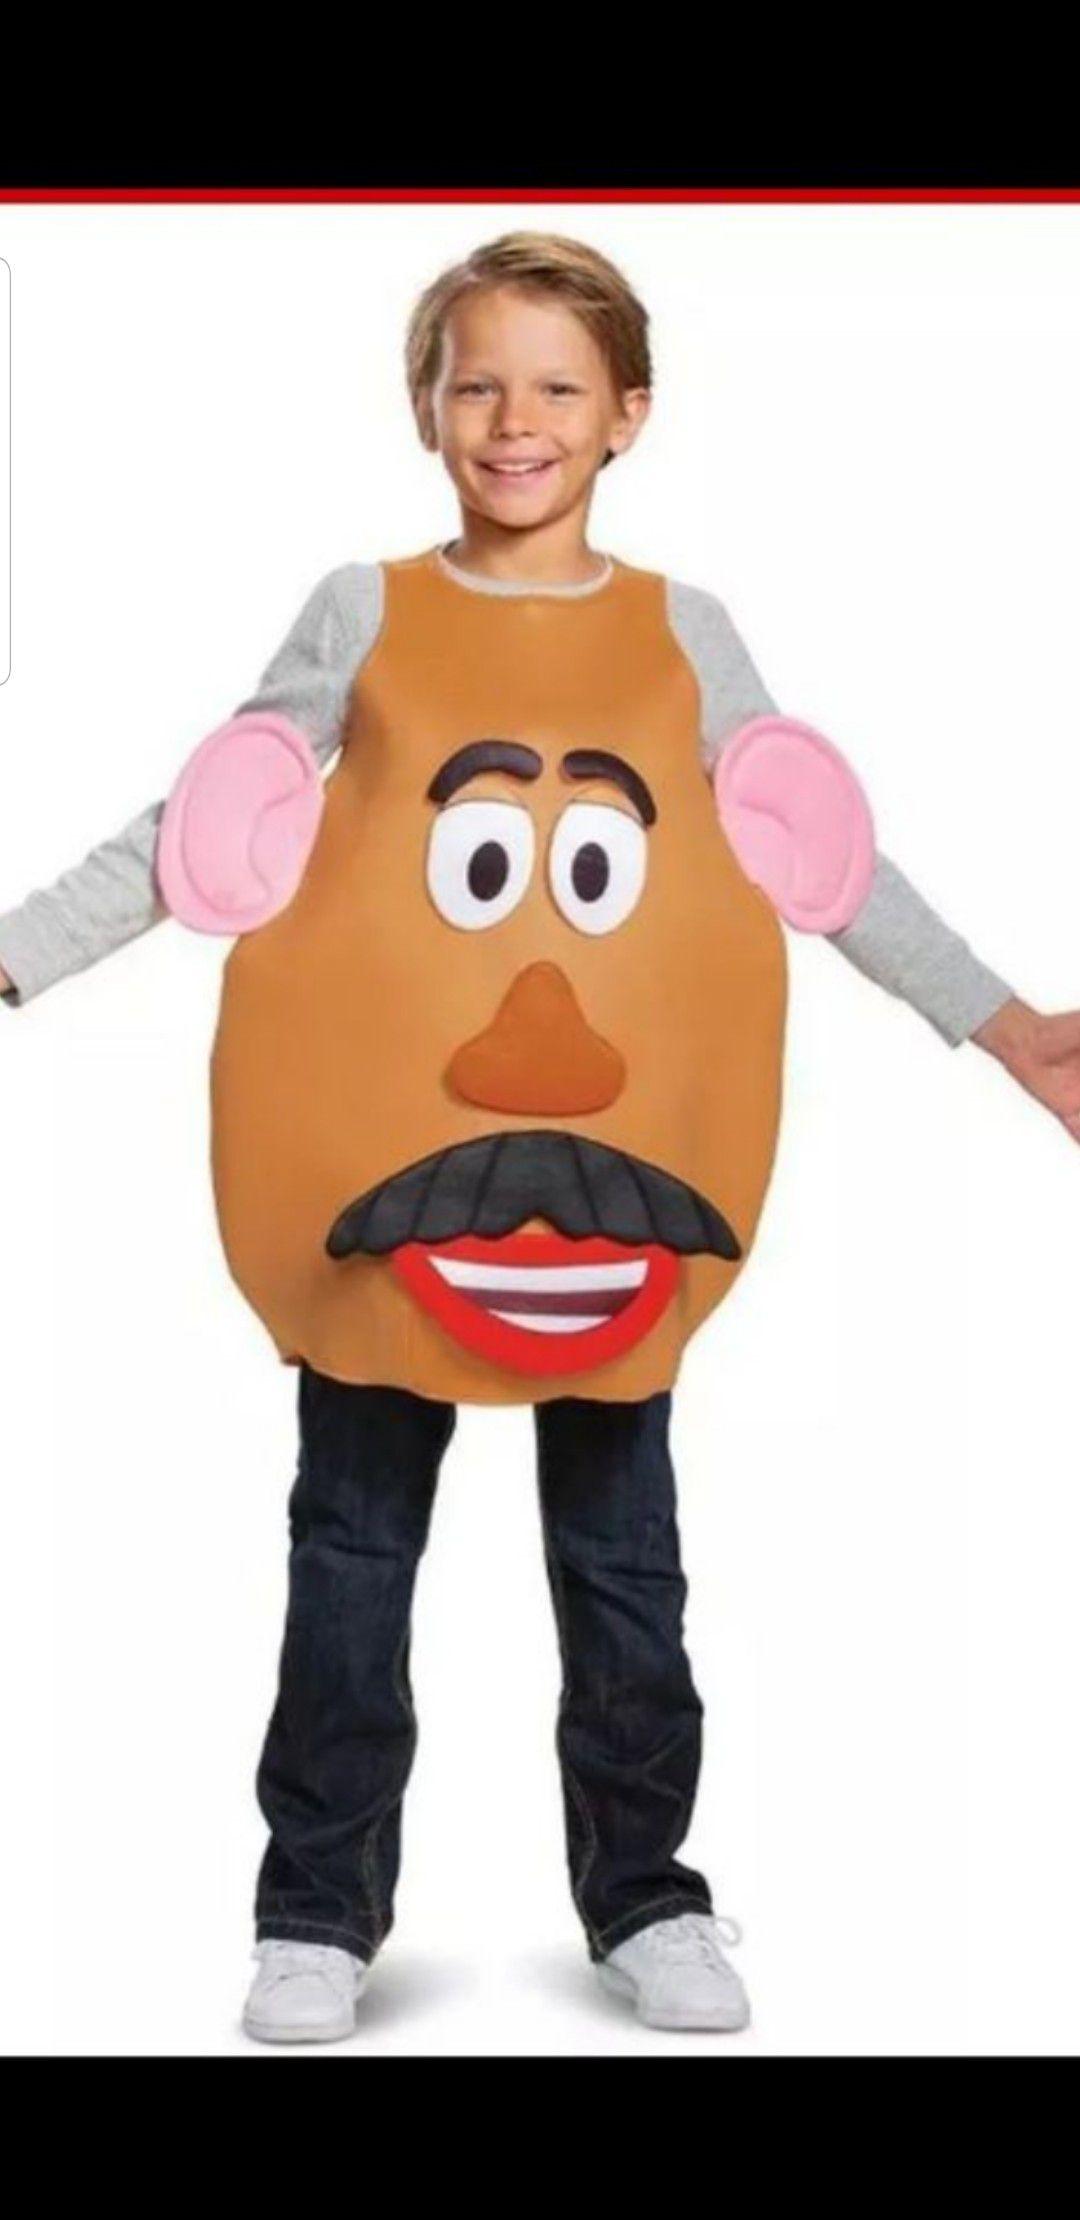 Toy story Mr.. Potato head costume